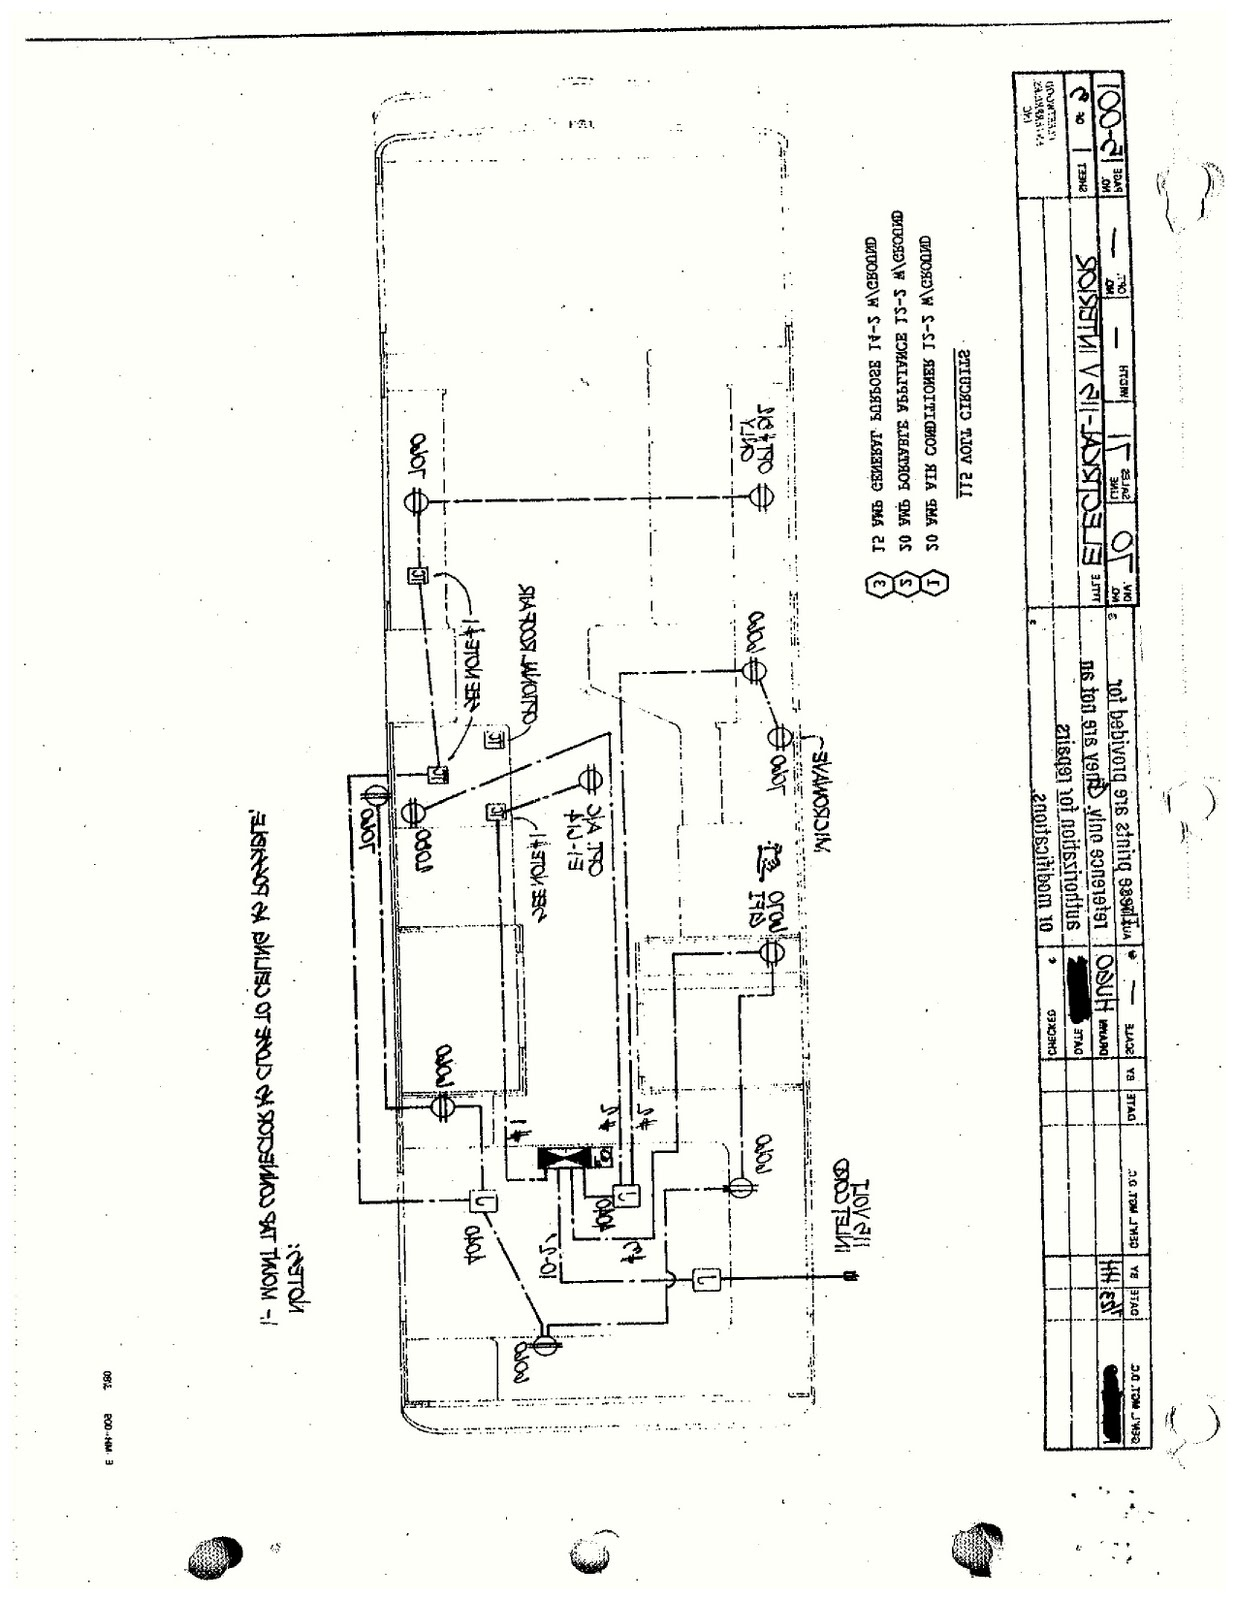 fleetwood mallard trailer wiring diagram simple wiring diagram 1992 fleetwood motorhome wiring diagram fleetwood mallard wiring [ 1236 x 1600 Pixel ]